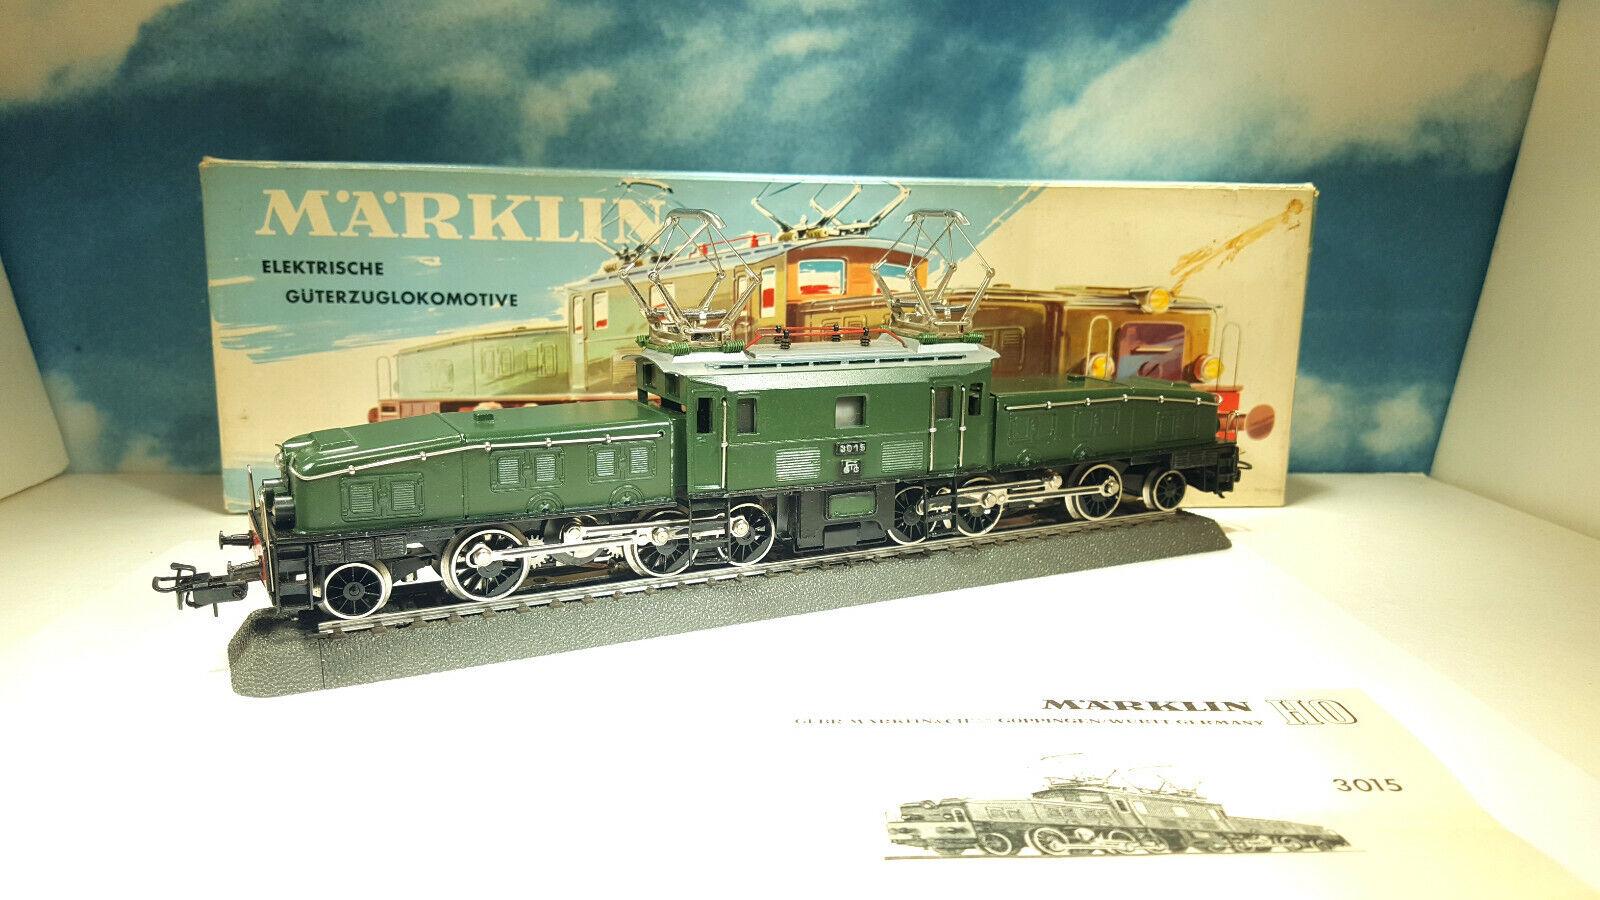 MARKLIN 3015 Ce 6 8 Krokodile 1960 HO OVP KSP.